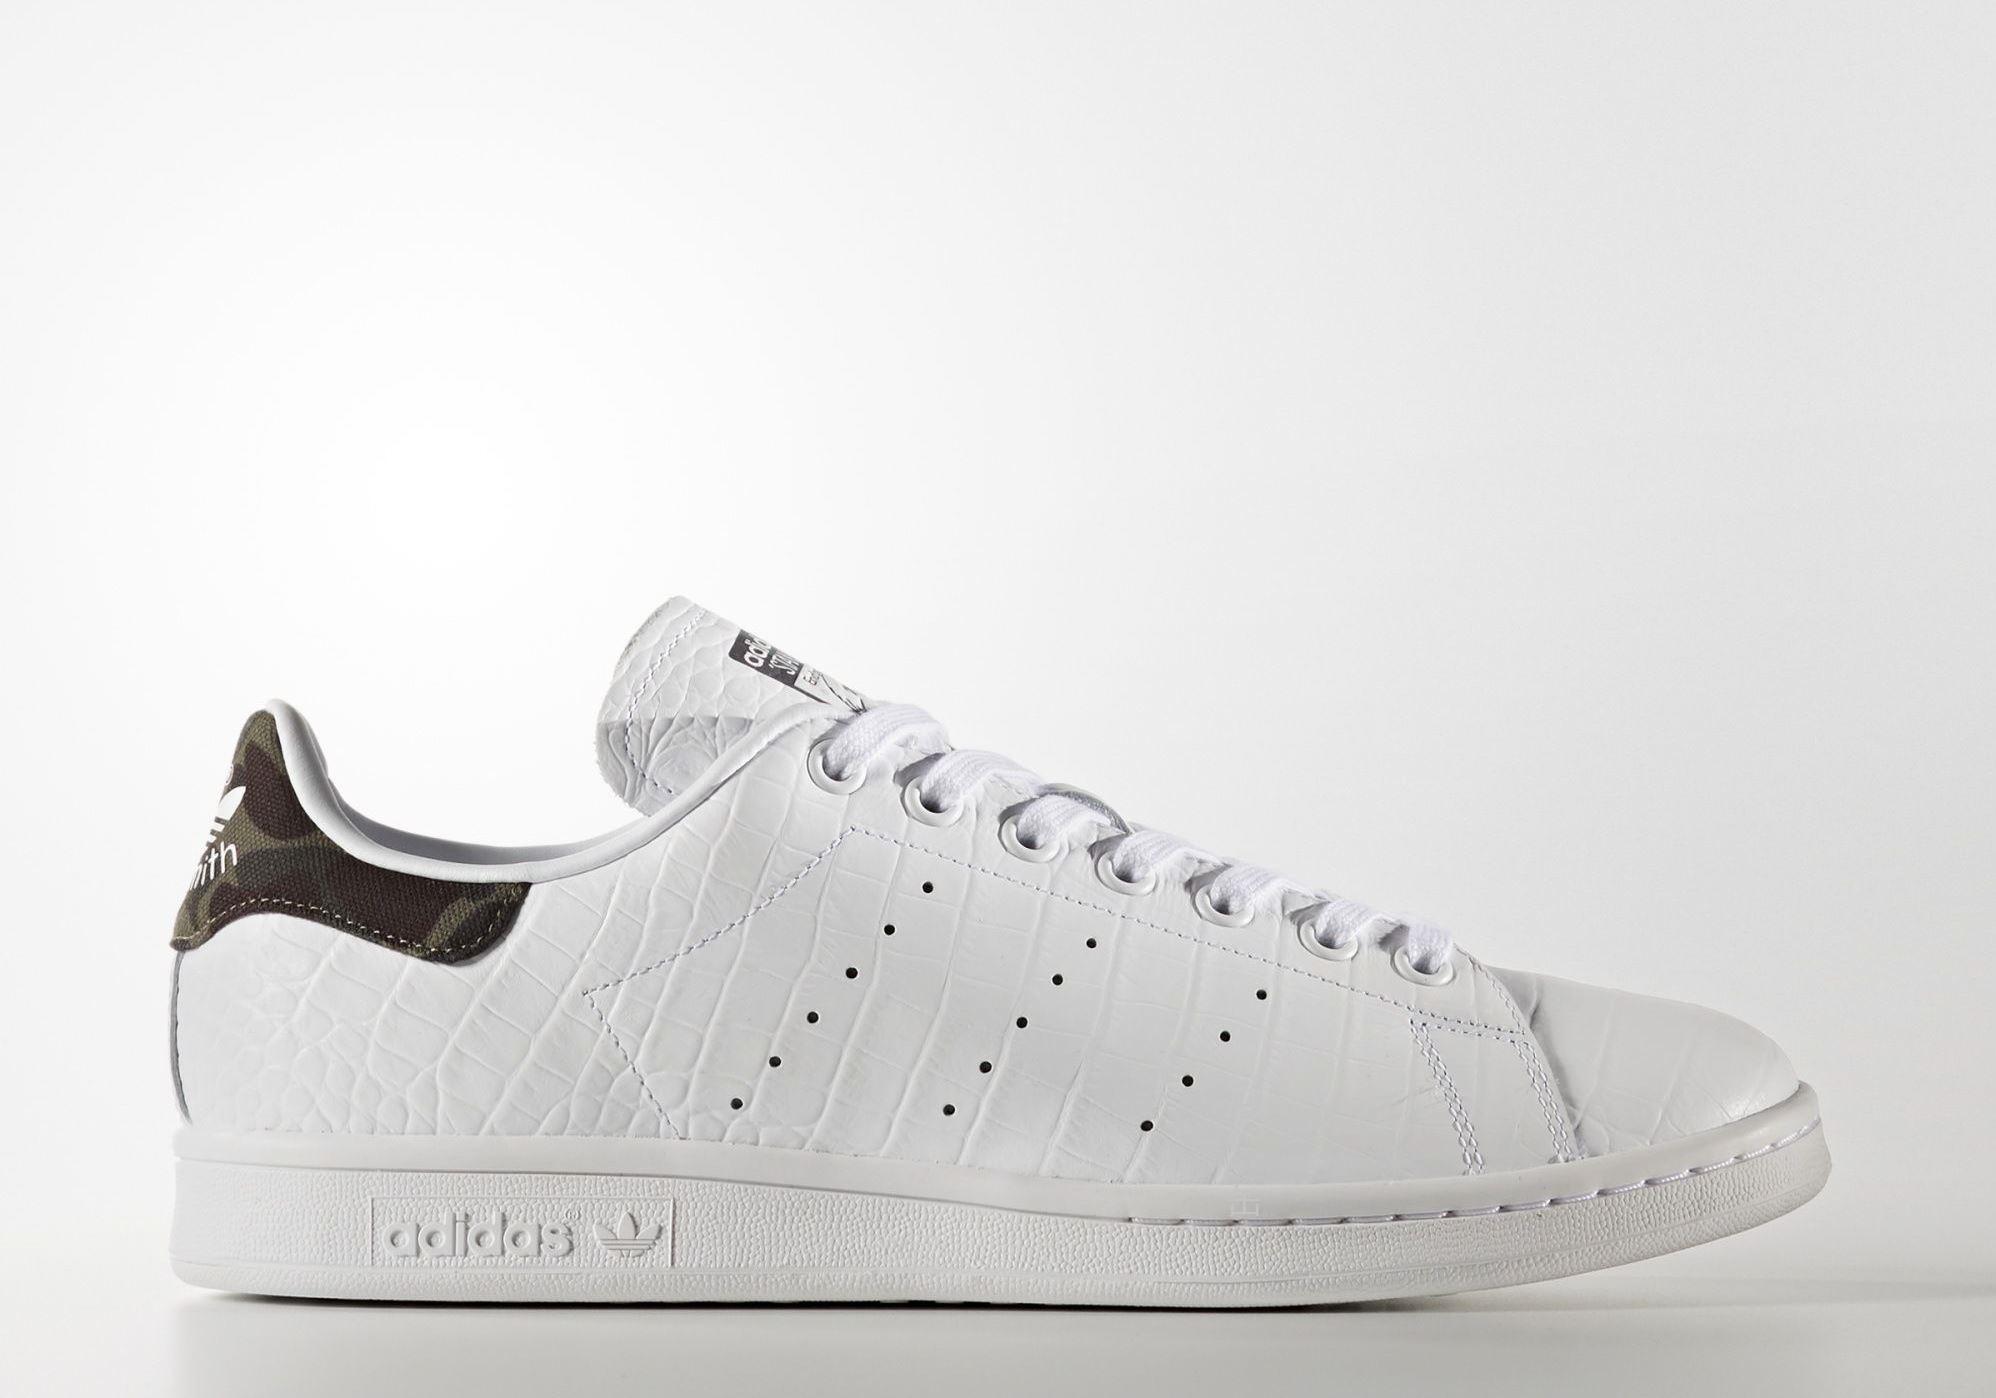 Adidas Originals Stan Smith Croc - Side